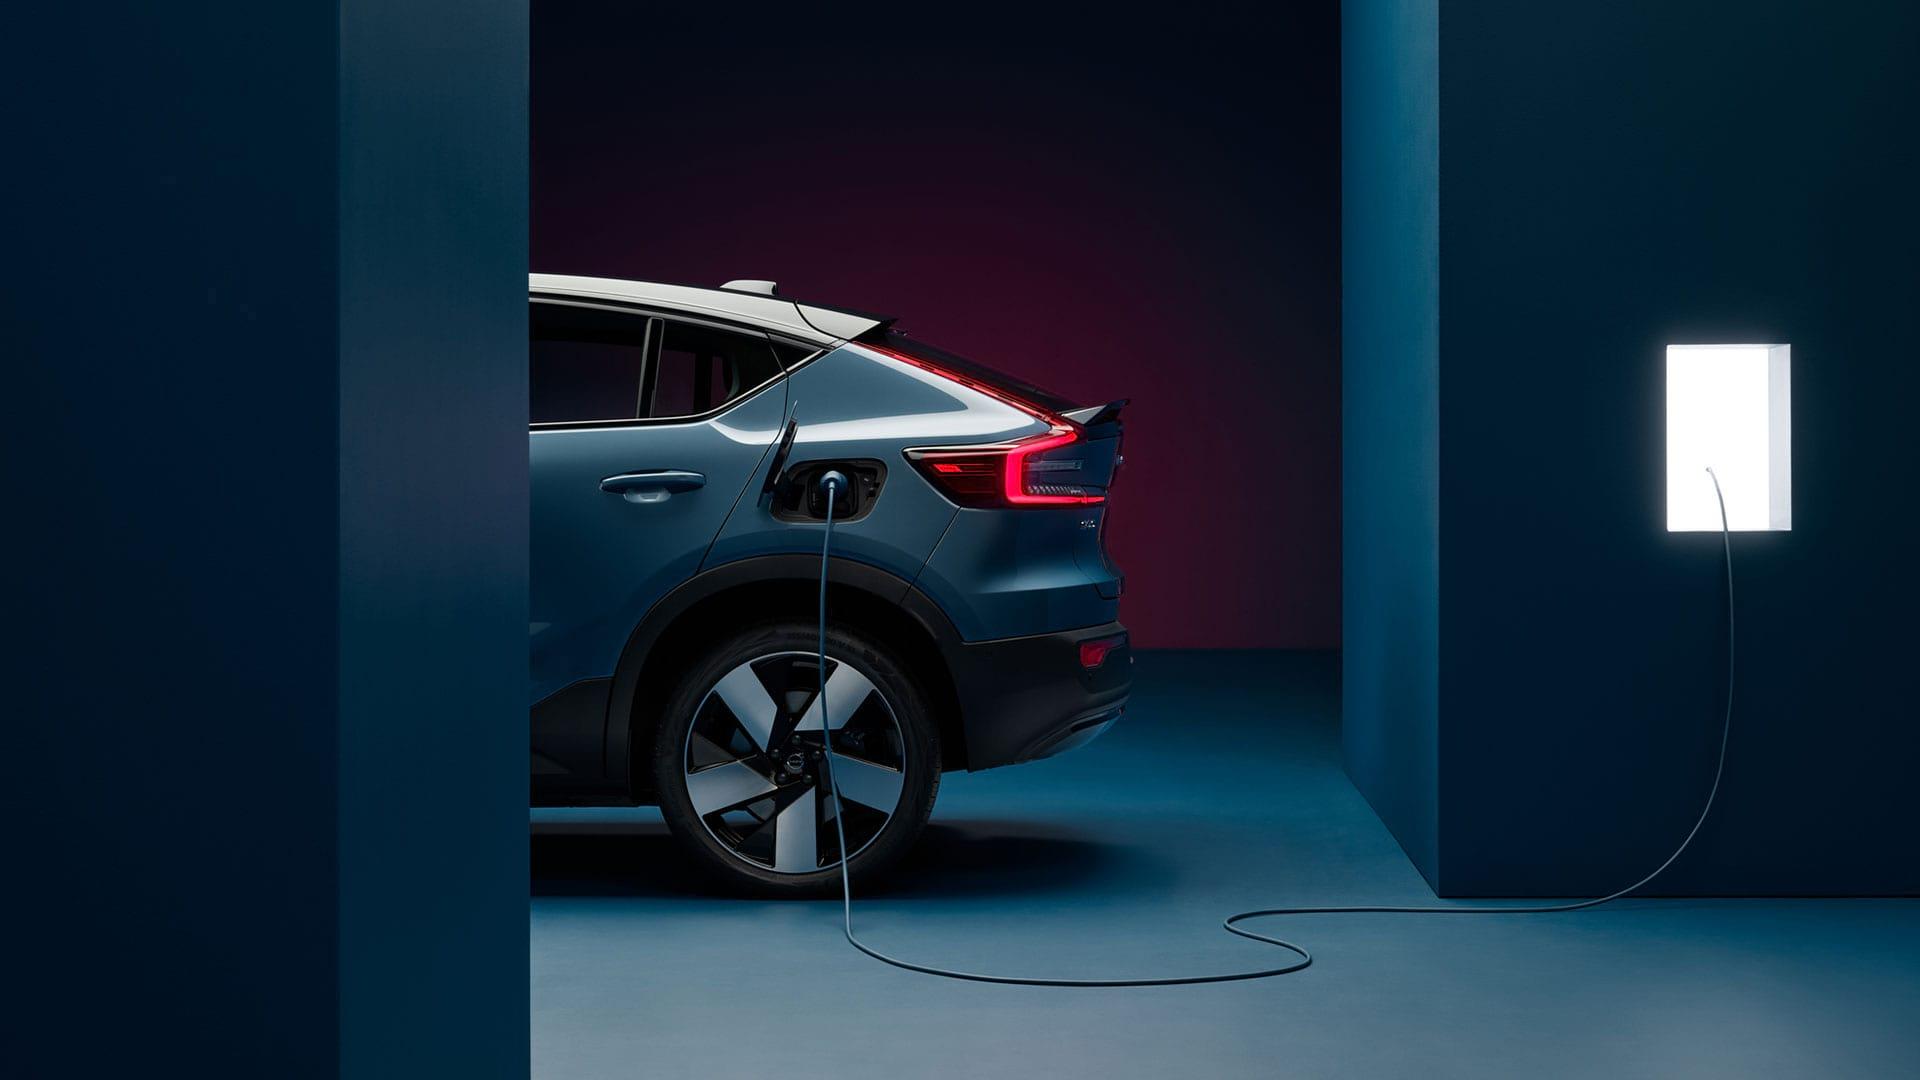 Син, целосно електричен Volvo C40.